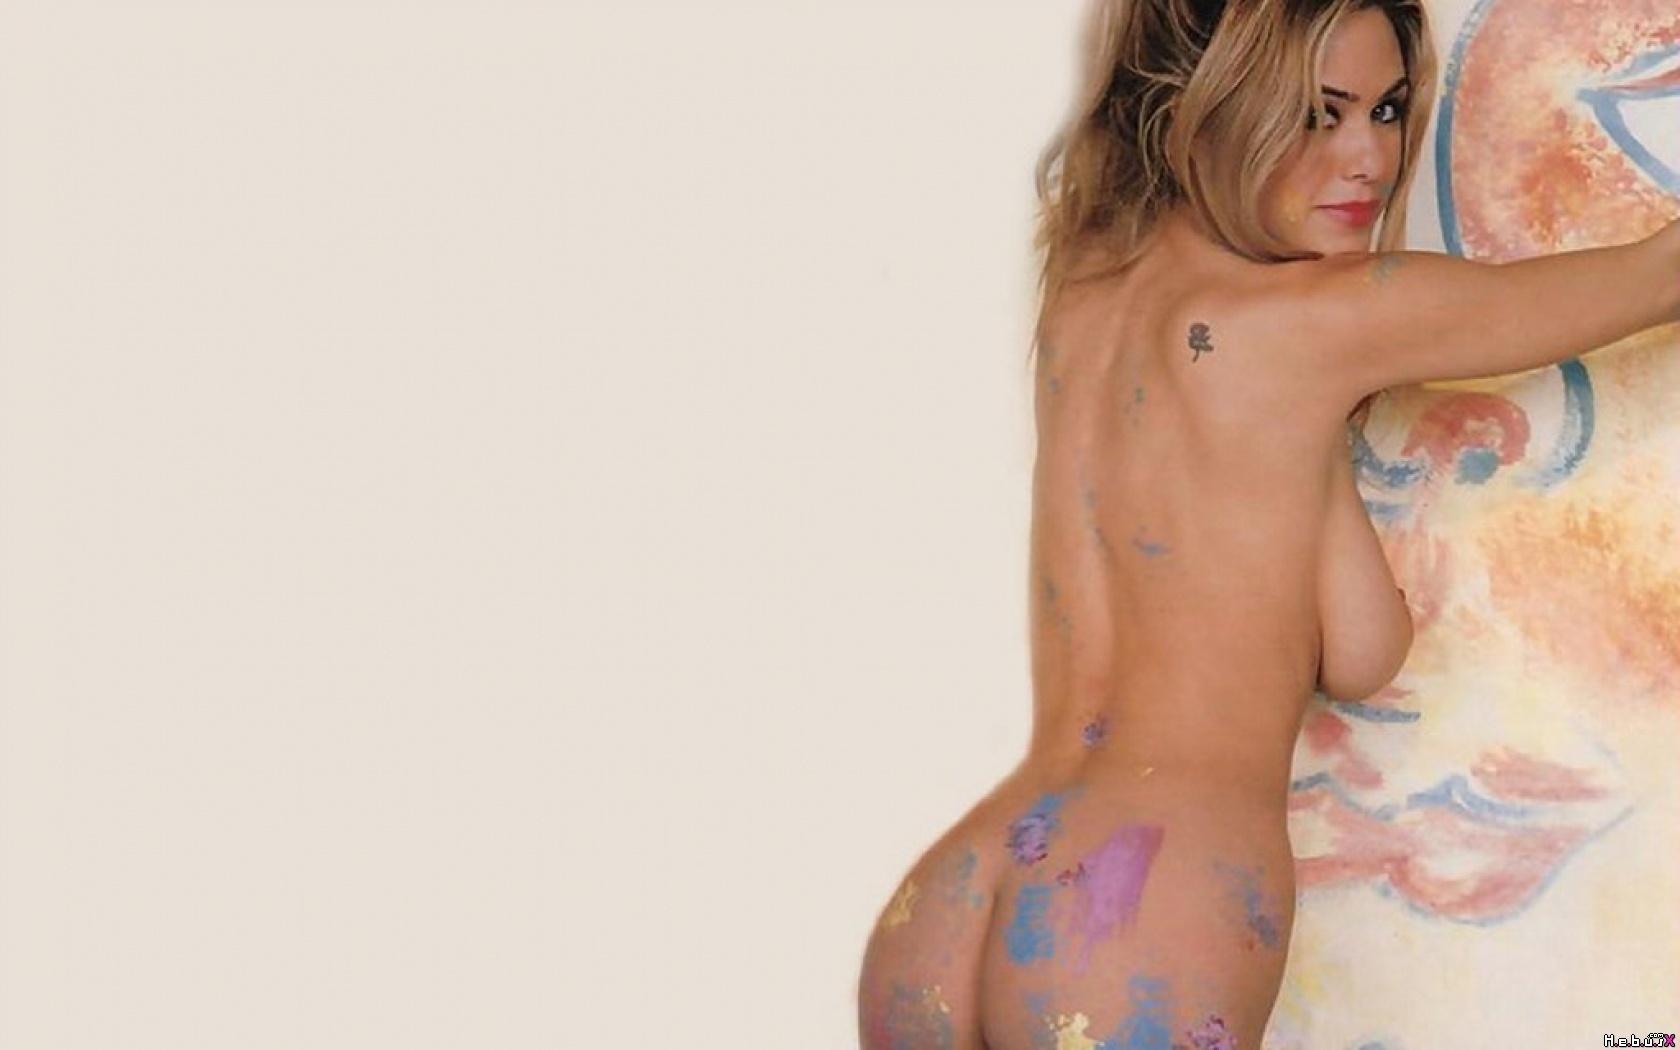 Ass Shauna Sand nudes (74 photo), Pussy, Sideboobs, Instagram, legs 2017